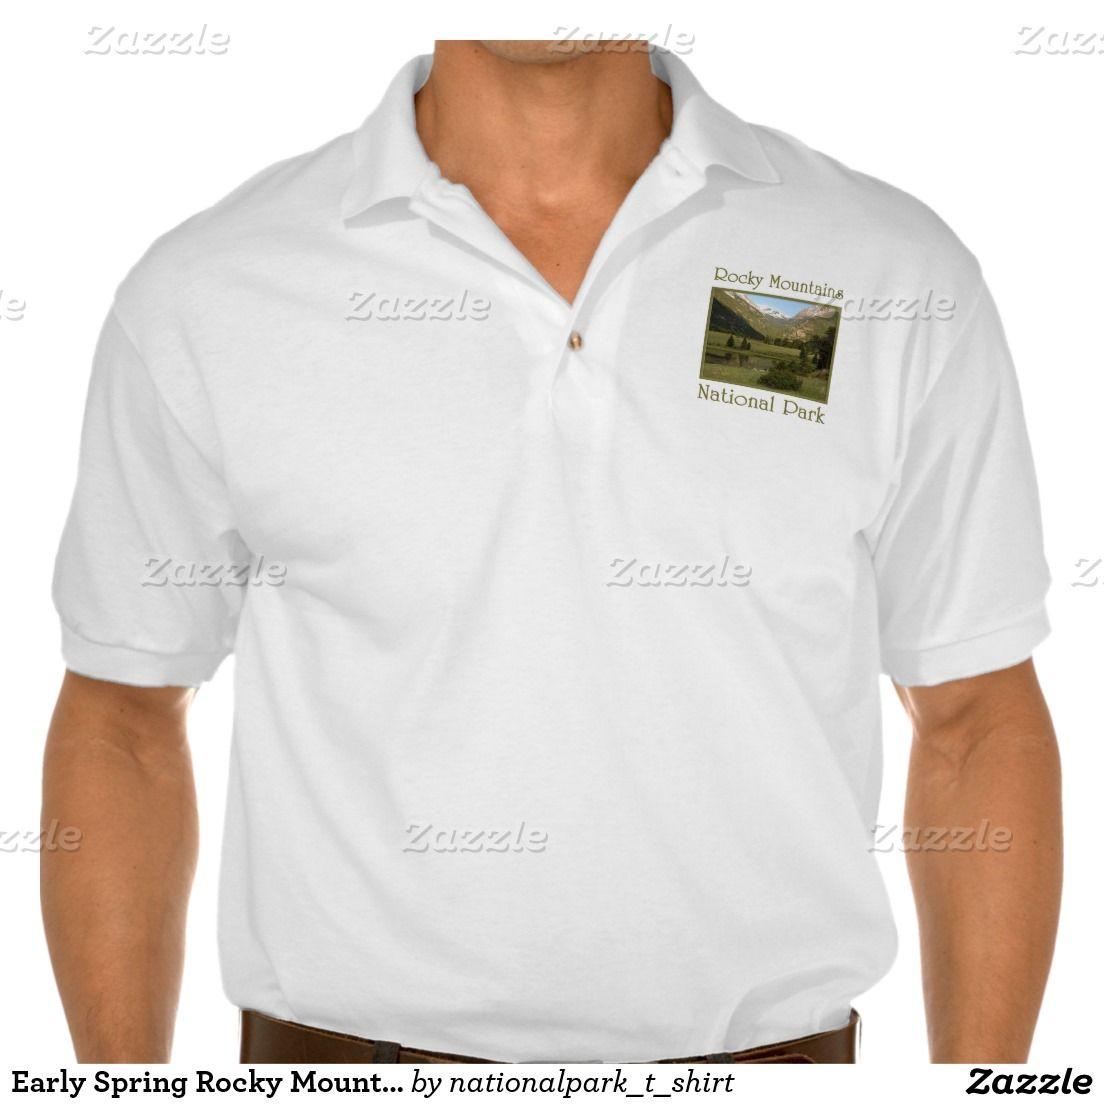 T Shirt Print Shop Colorado Springs Lauren Goss